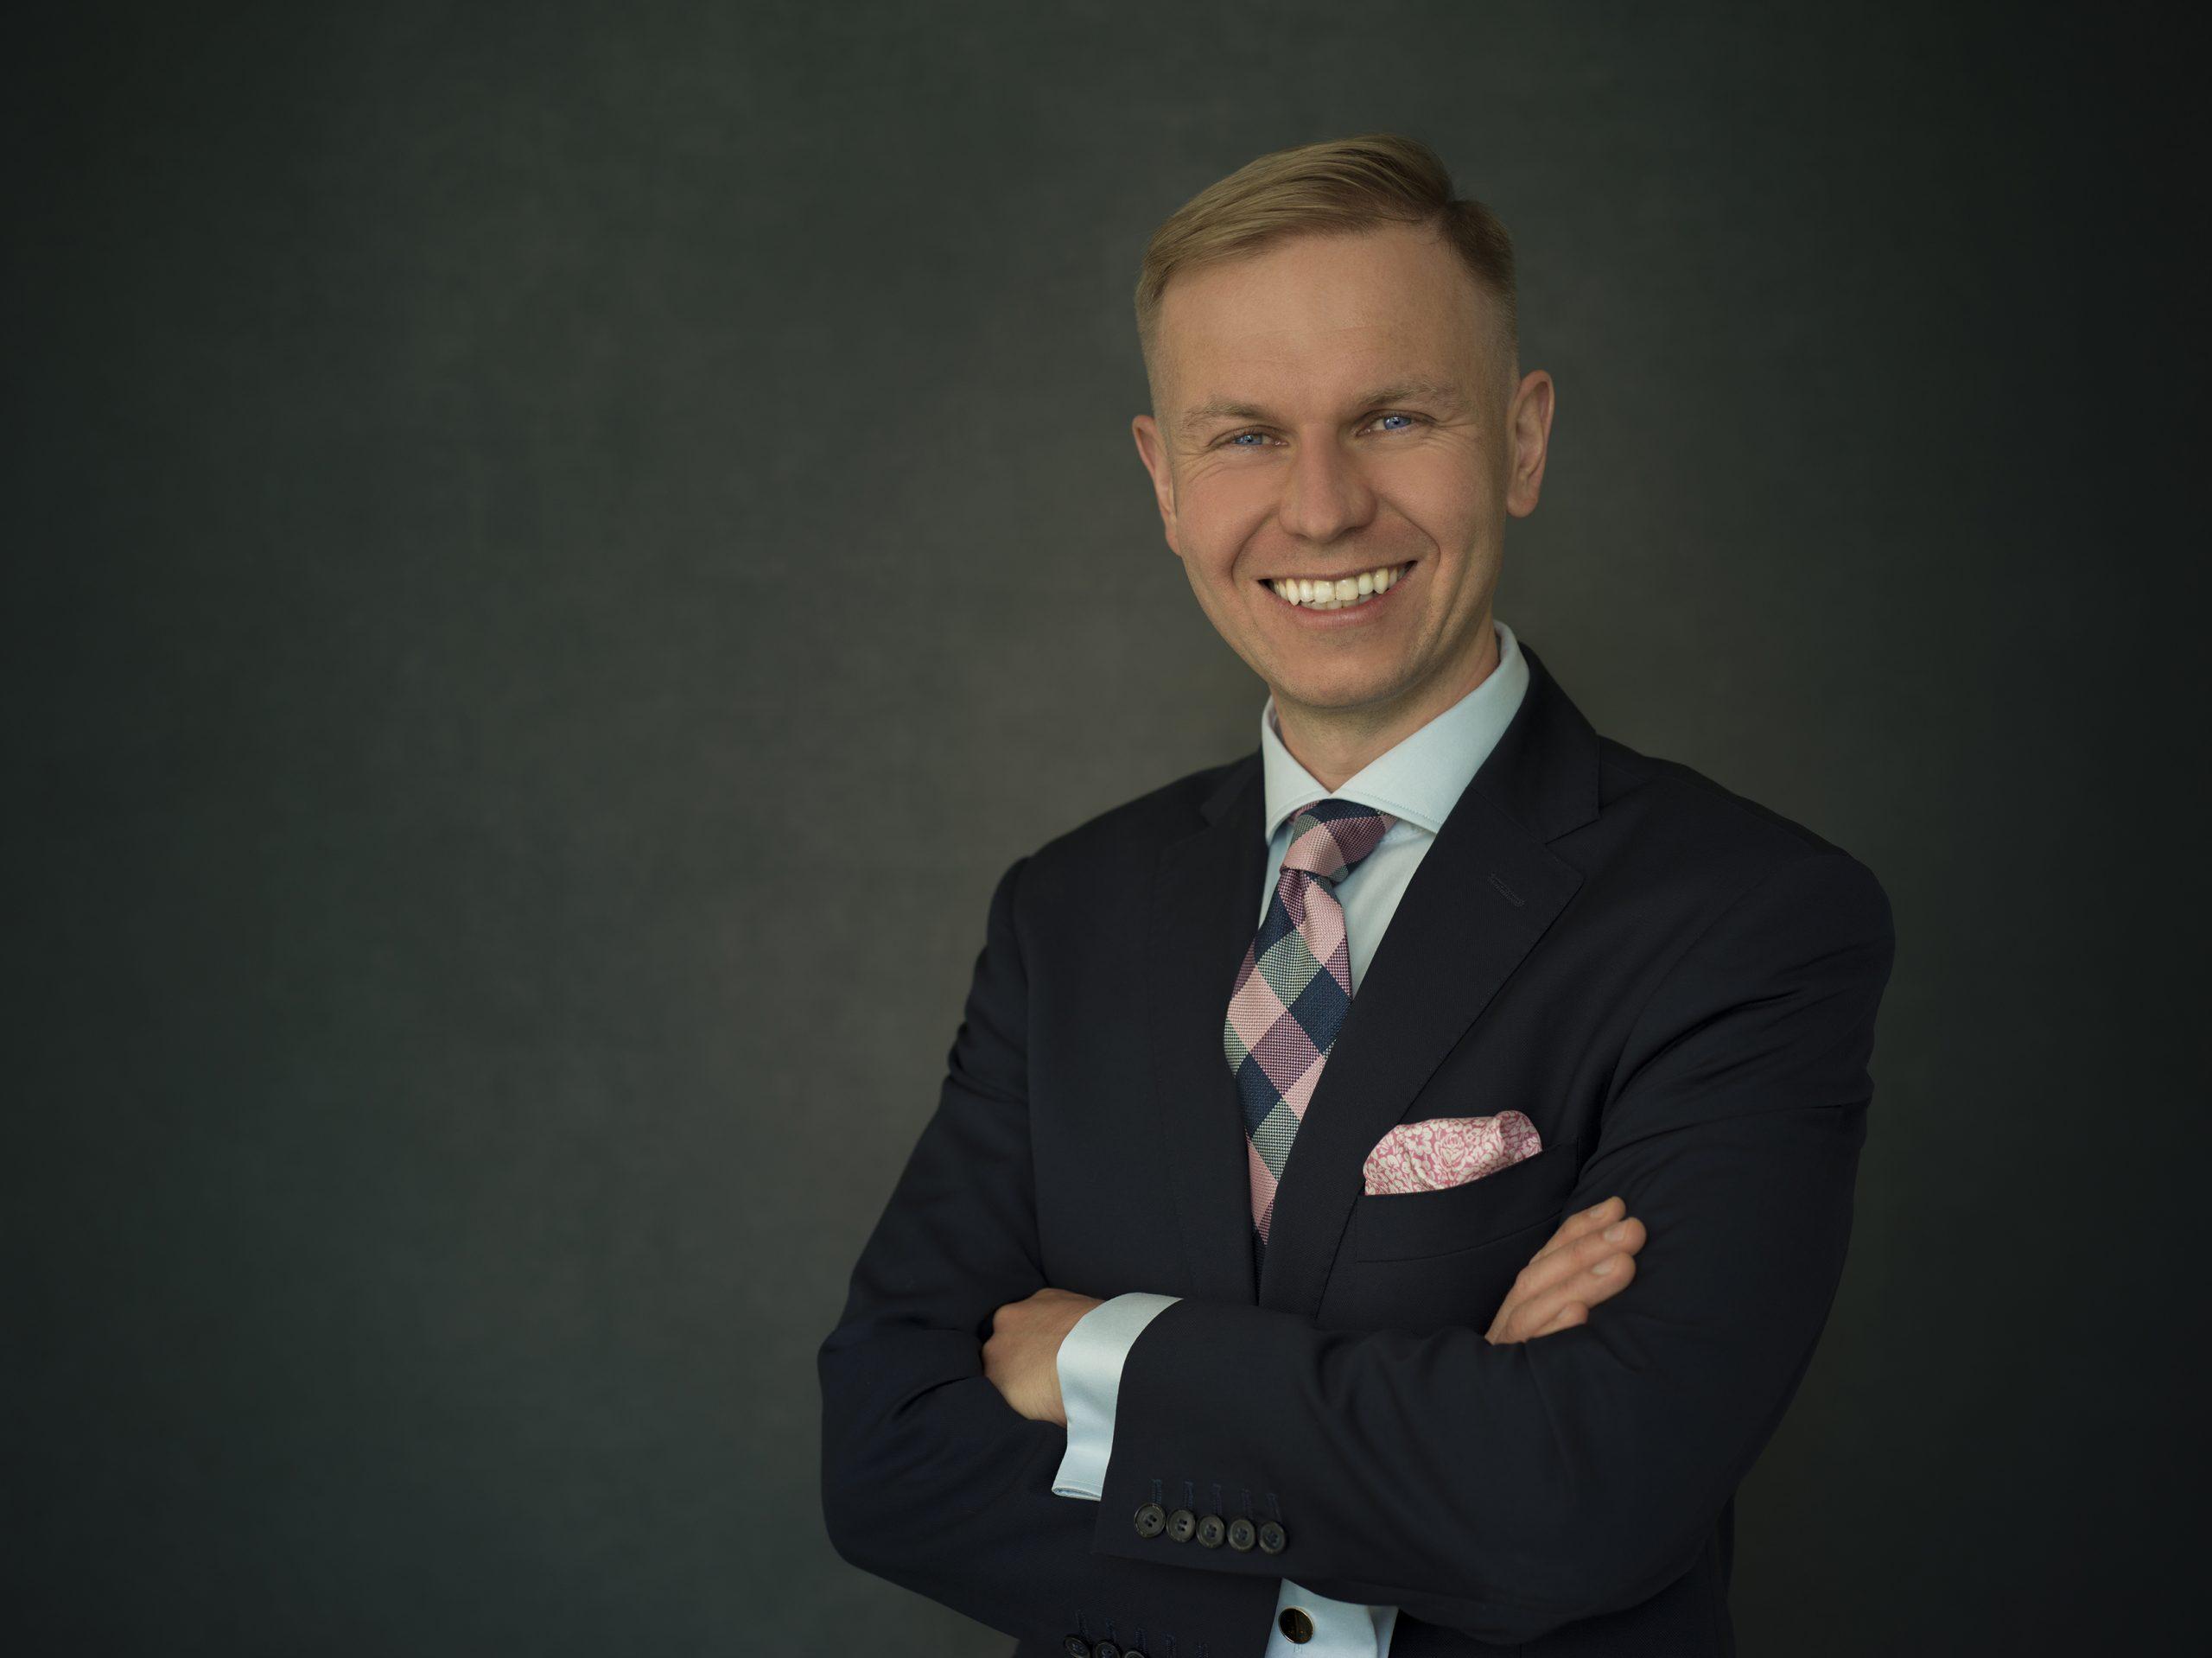 Tomasz Mrozowski, Grupa 3S